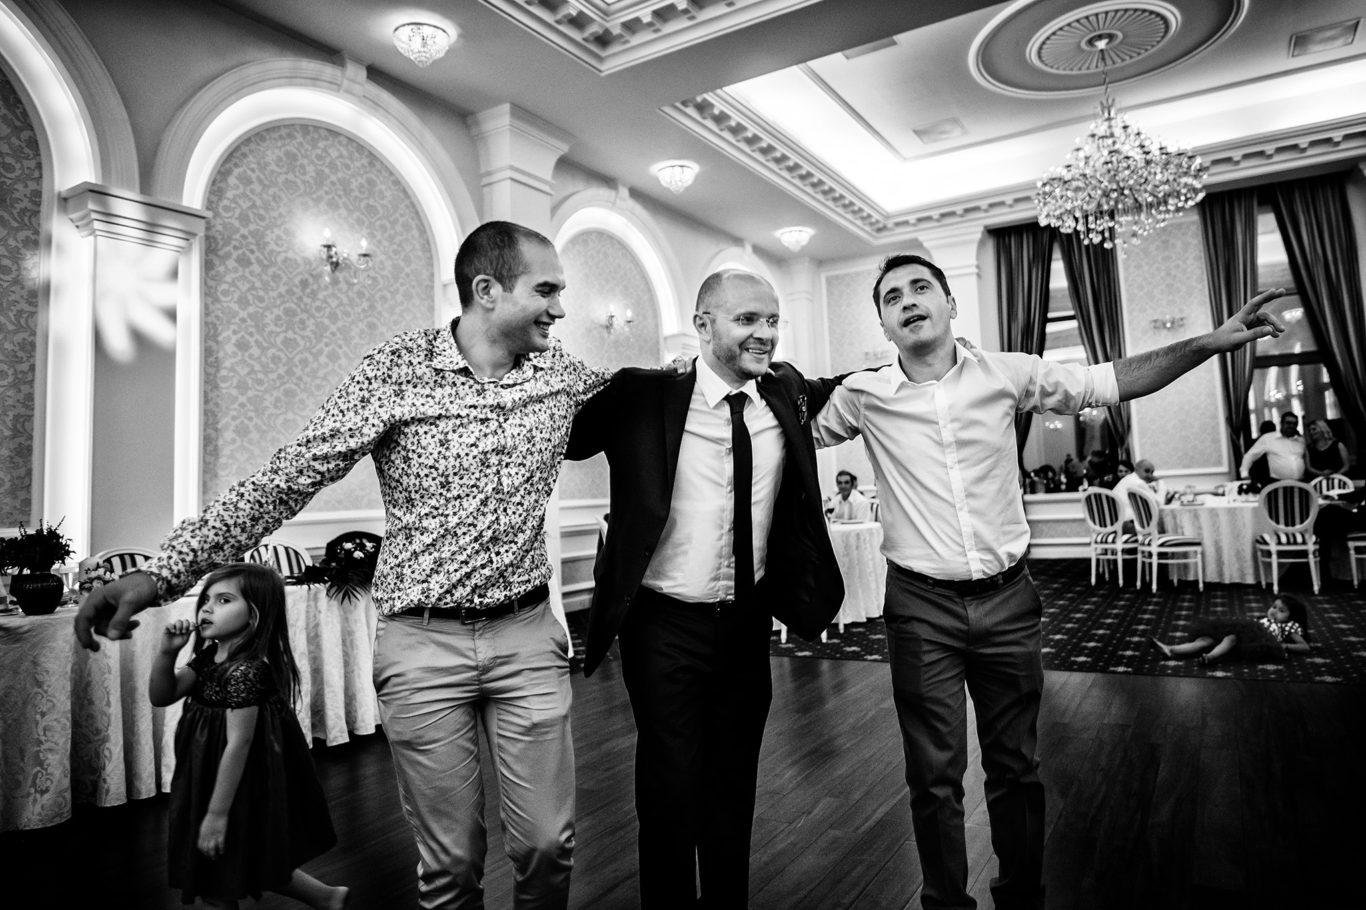 0734-fotografie-nunta-bucuresti-anca-george-fotograf-ciprian-dumitrescu-dsc_9639